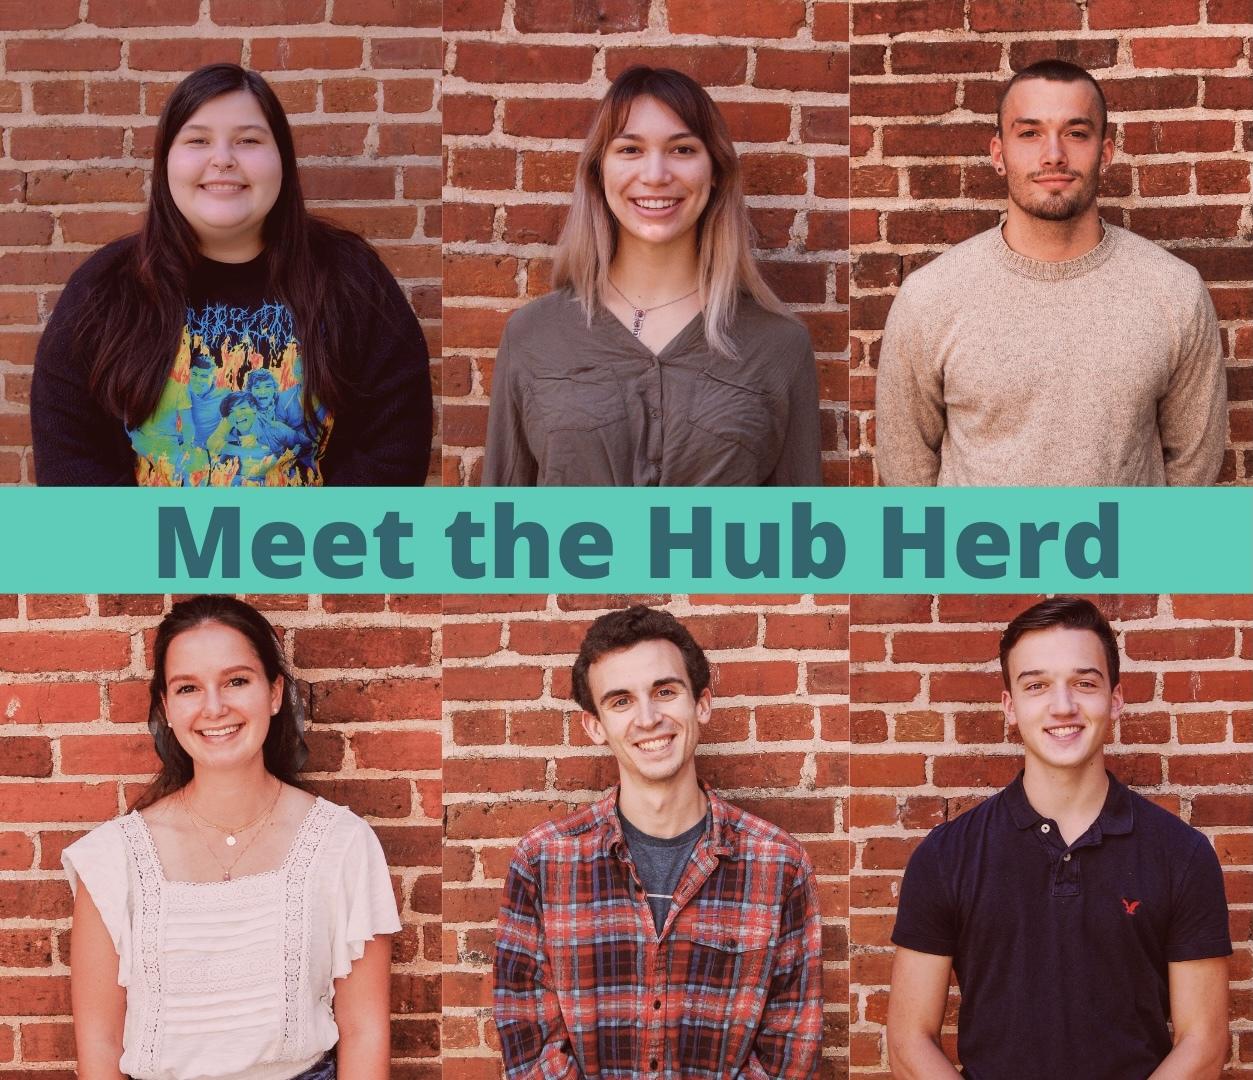 Headshots of the the Fall 2020 Hub Herd